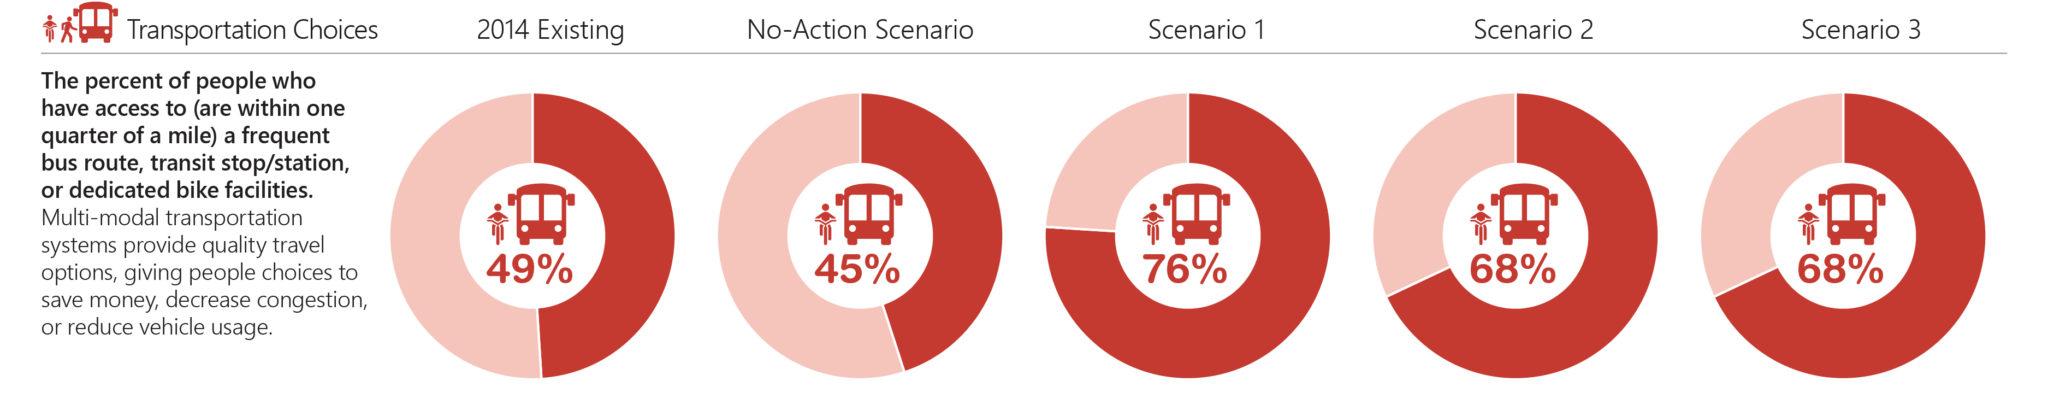 Transportation choices performance measure.